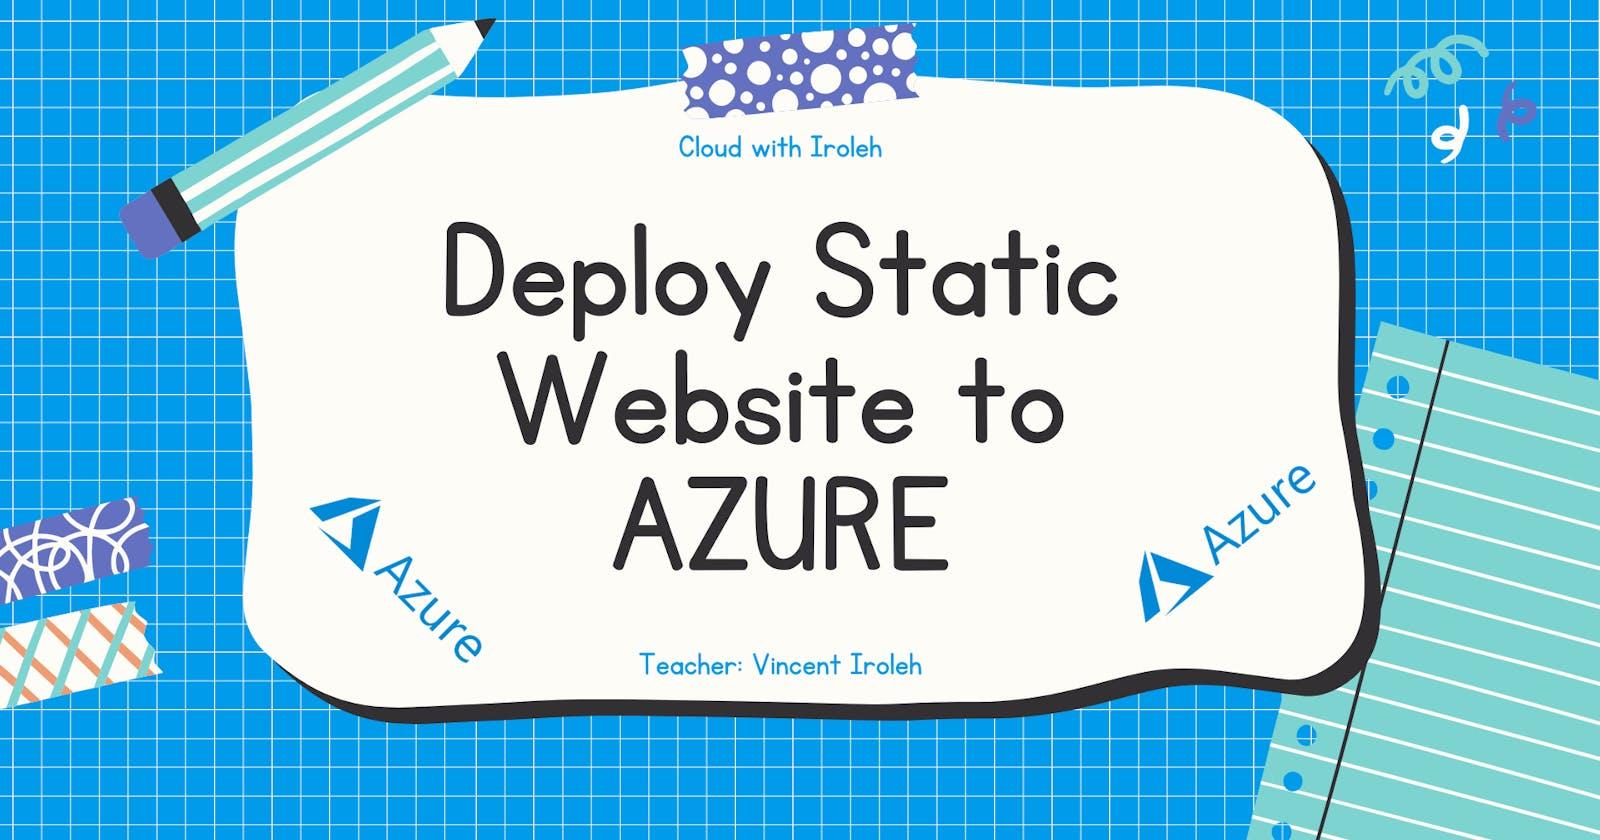 Azure Storage and Azure CDN for Static Website Hosting?